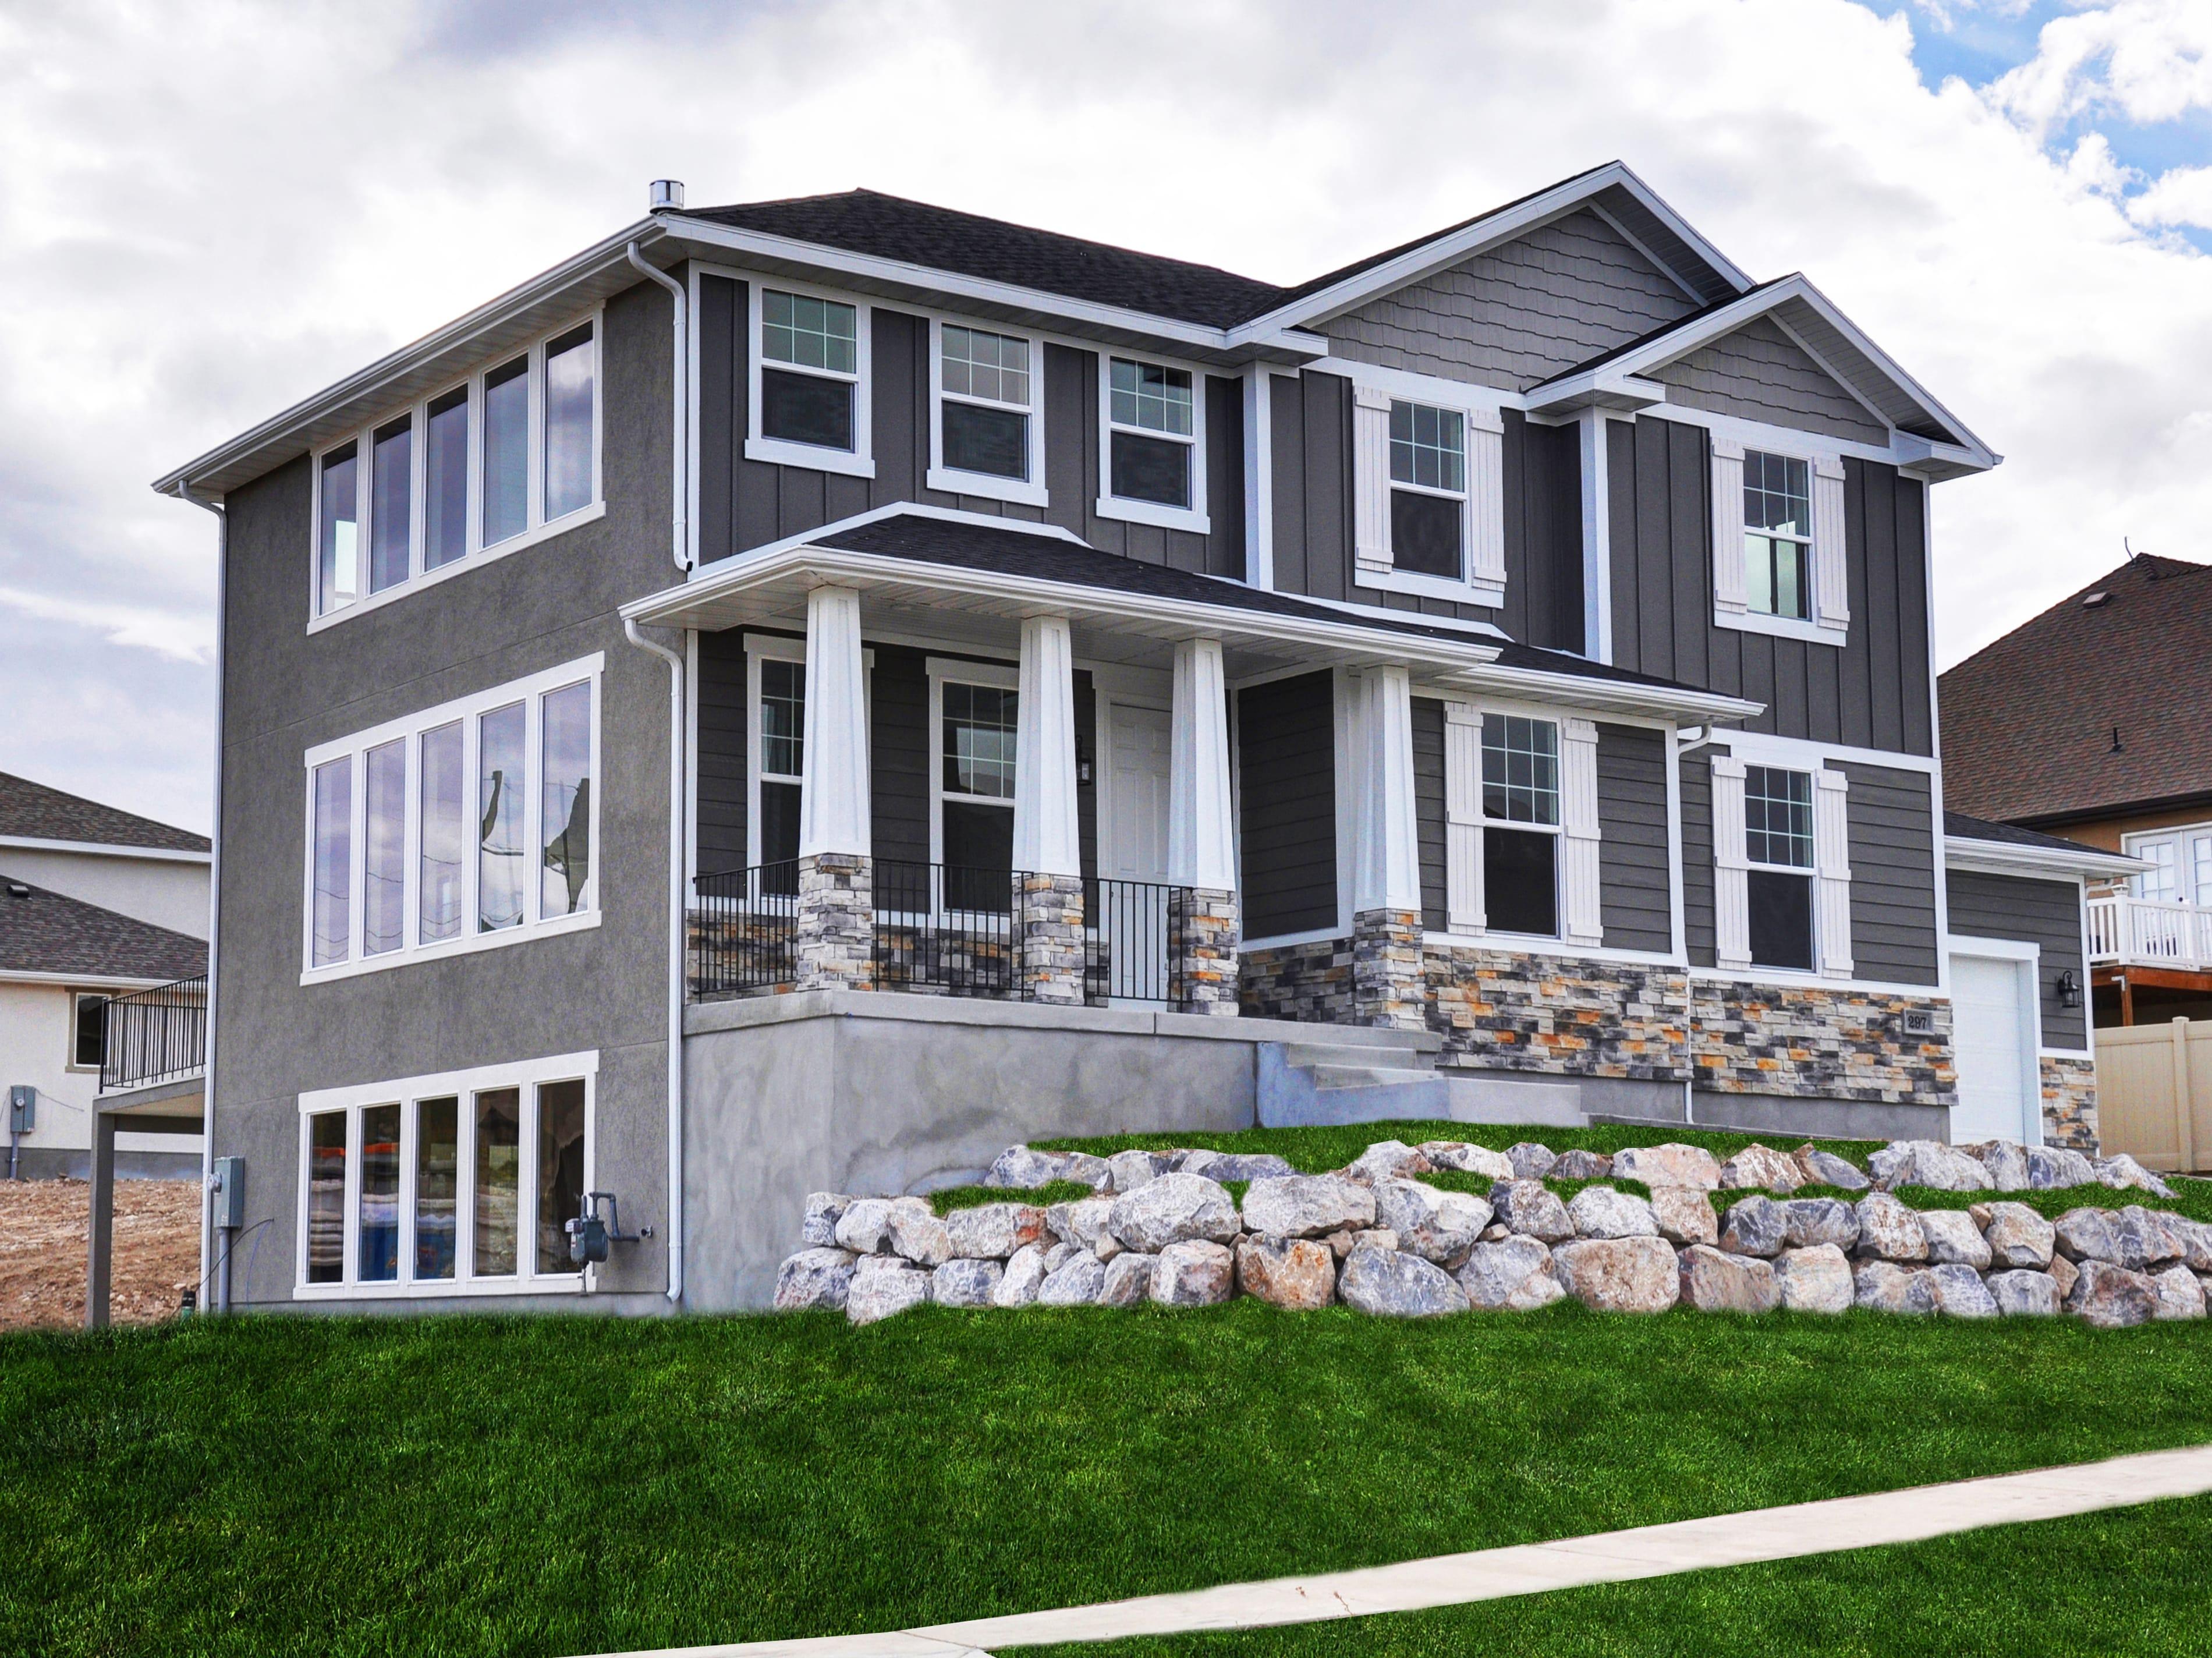 Custom Home Front Elevation : Front elevation lightyear homes utah custom home builder